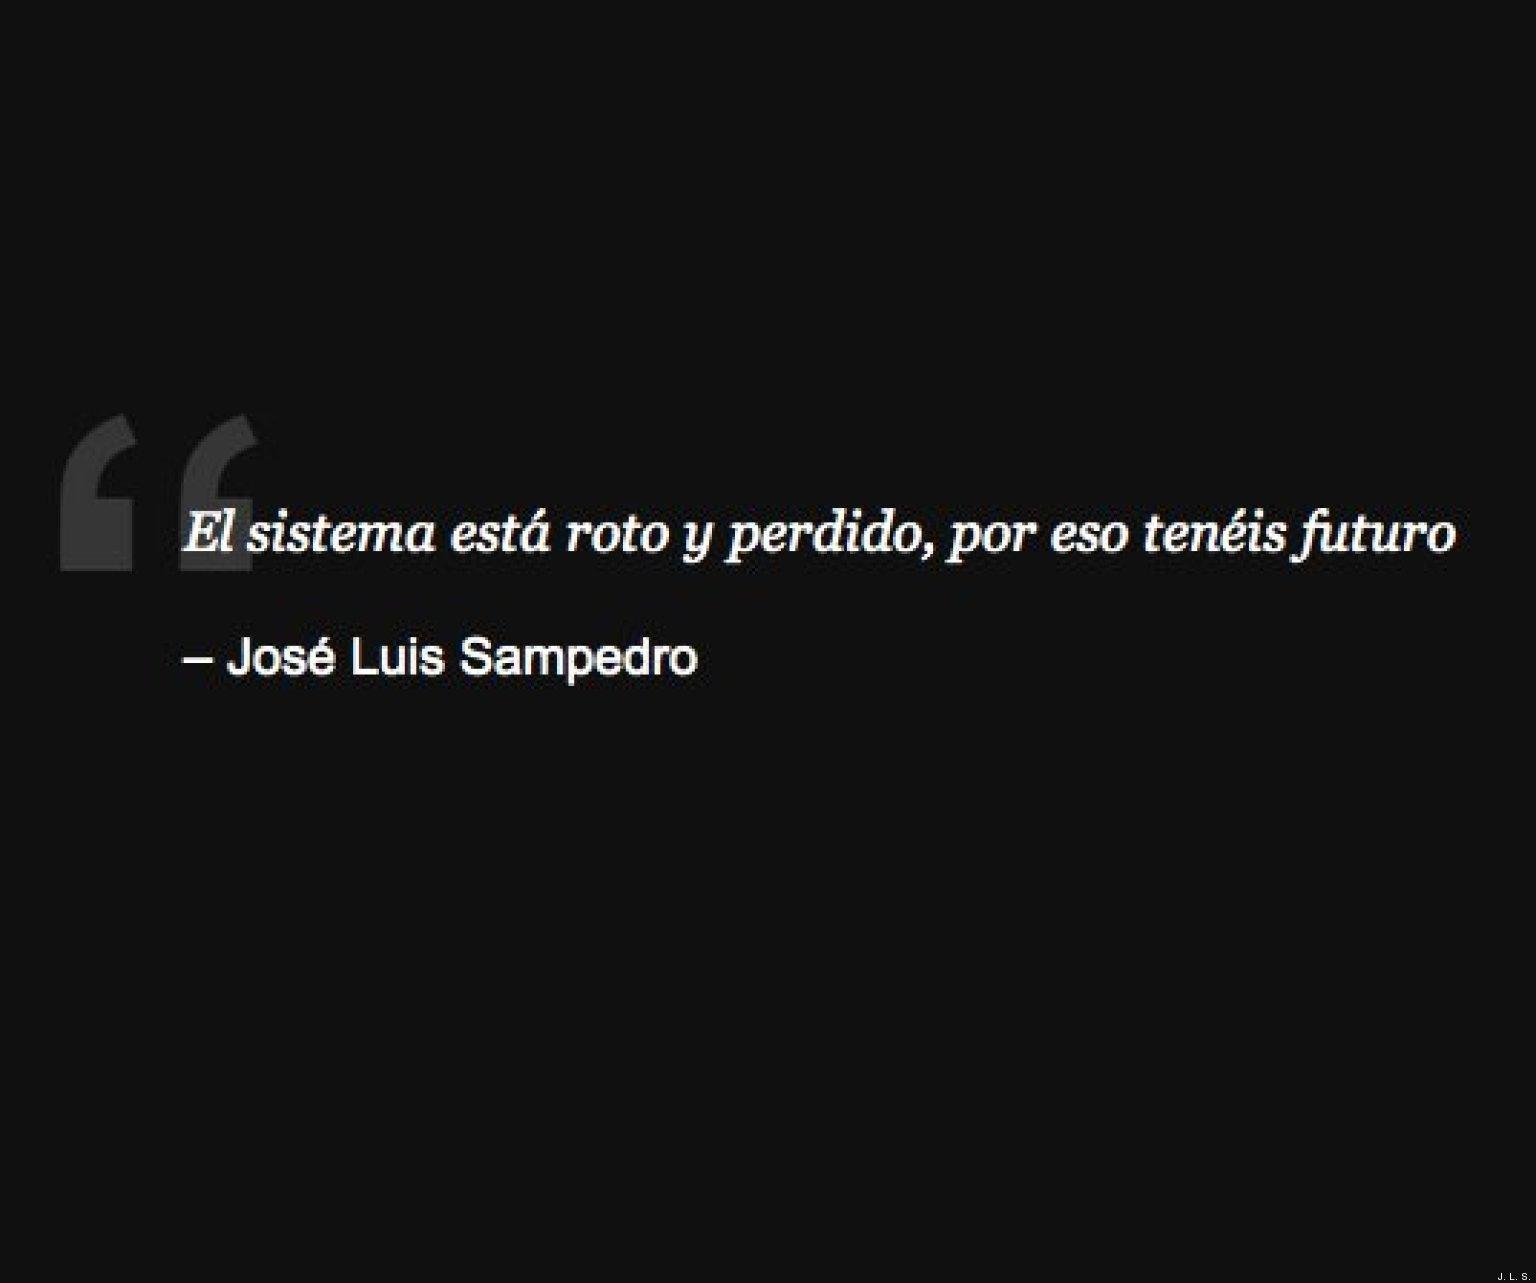 JOSE LUIS SAMPEDRO FRASES facebook.jpg #5C4E46 1536x1283